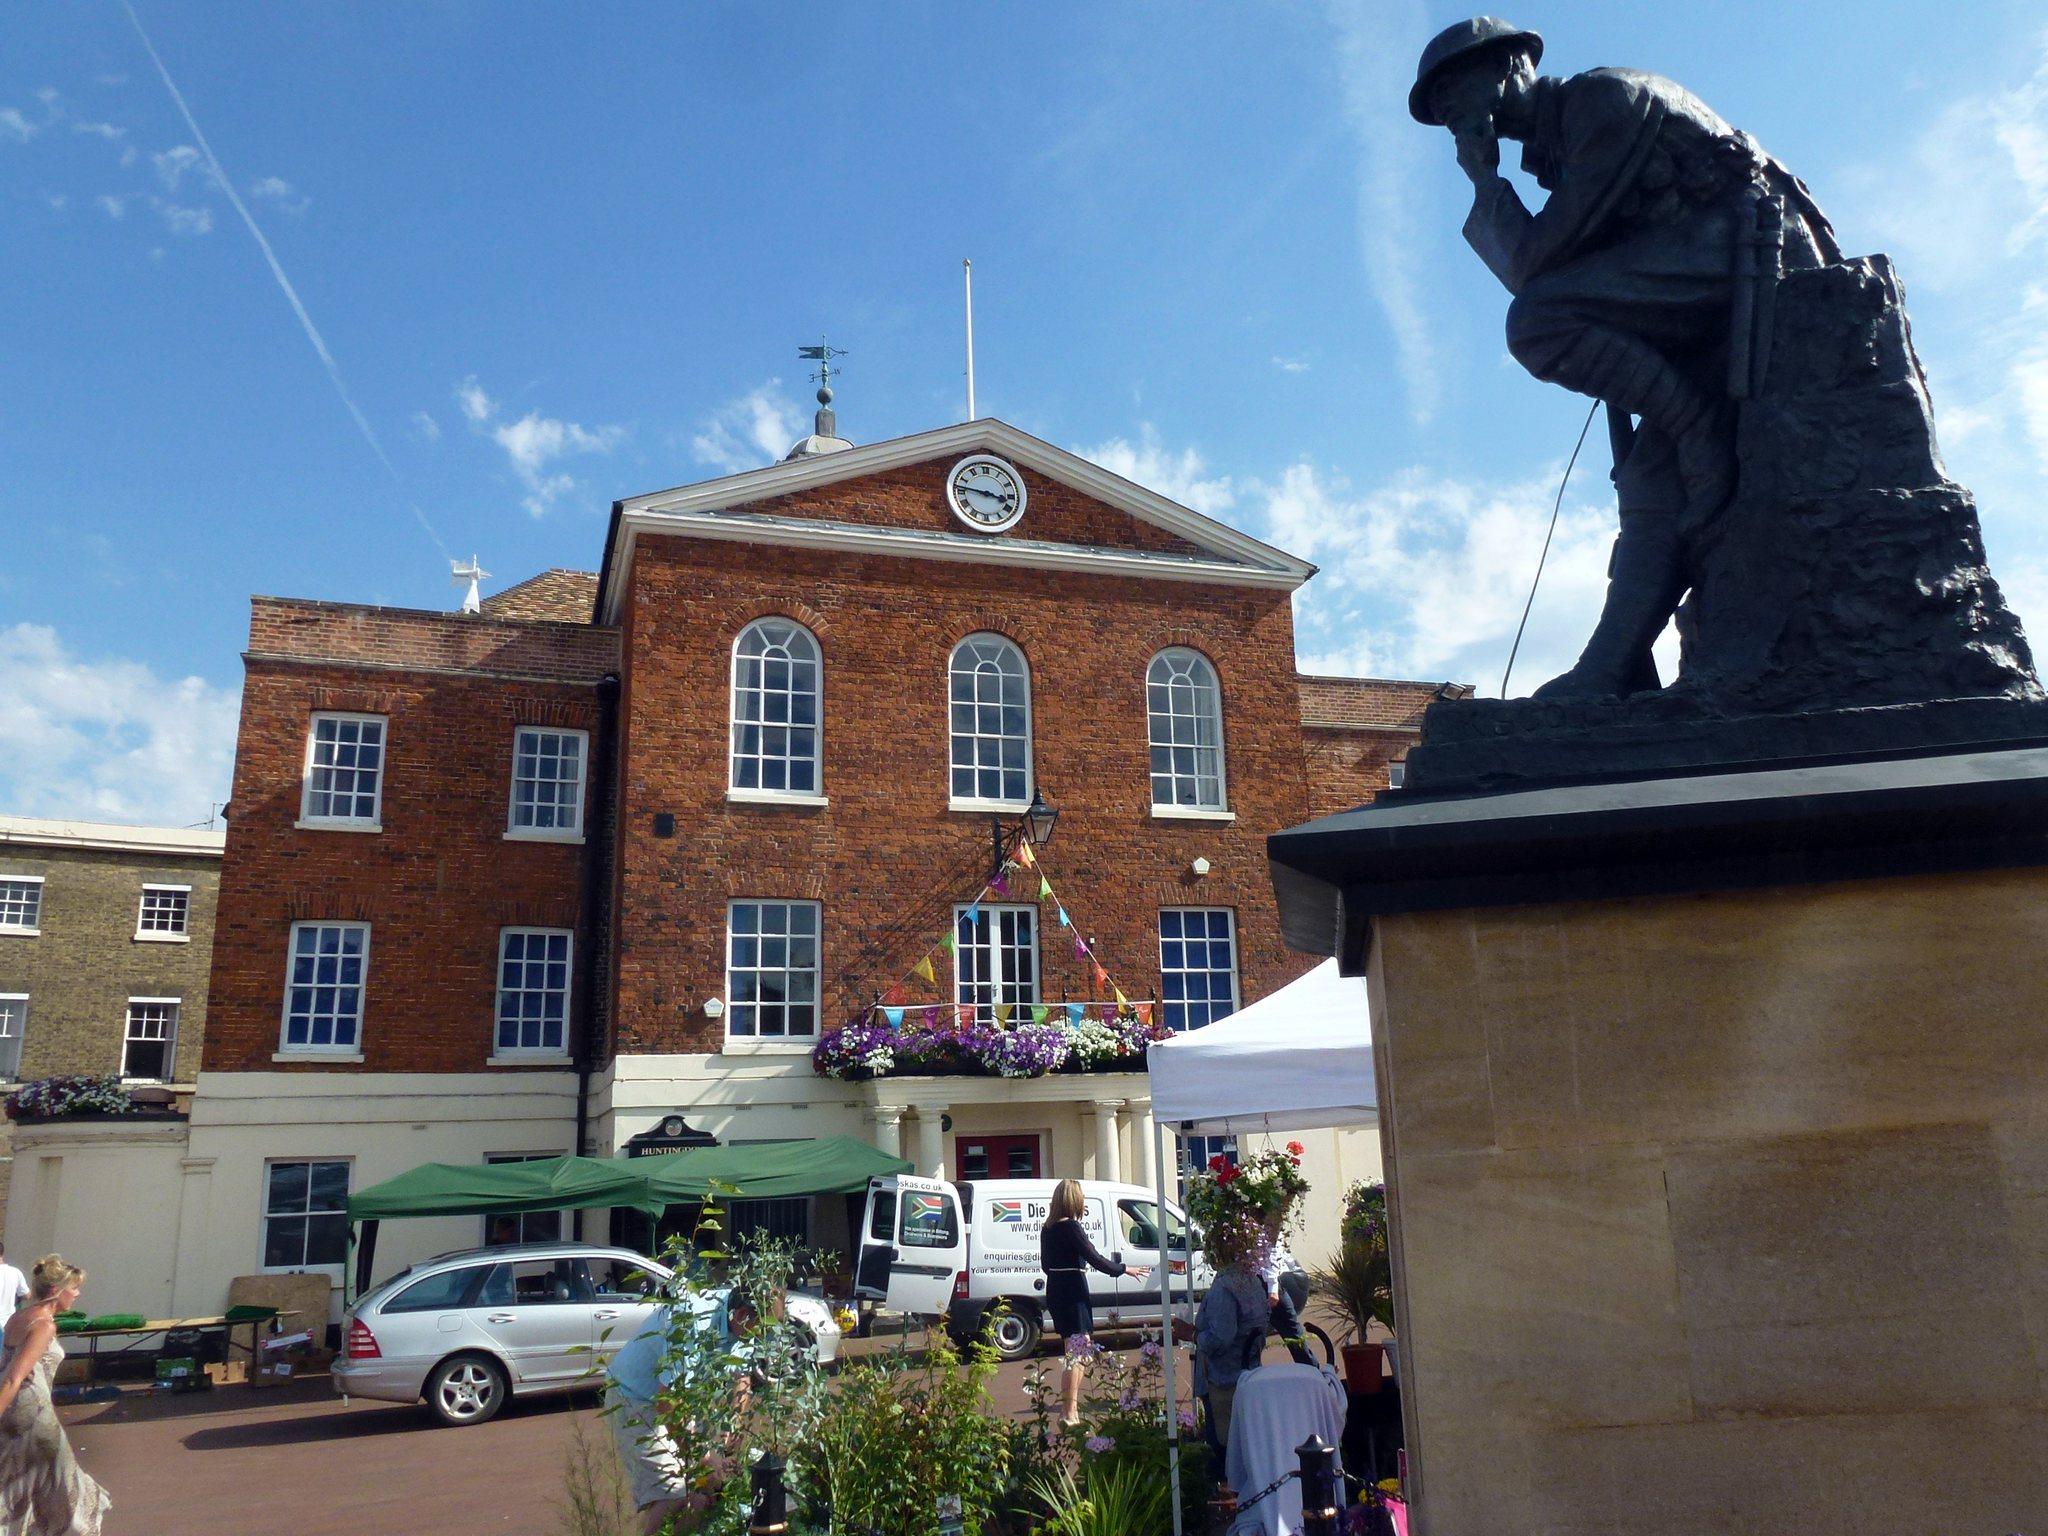 Cmglee_Huntingdon_town_hall_war_memorial